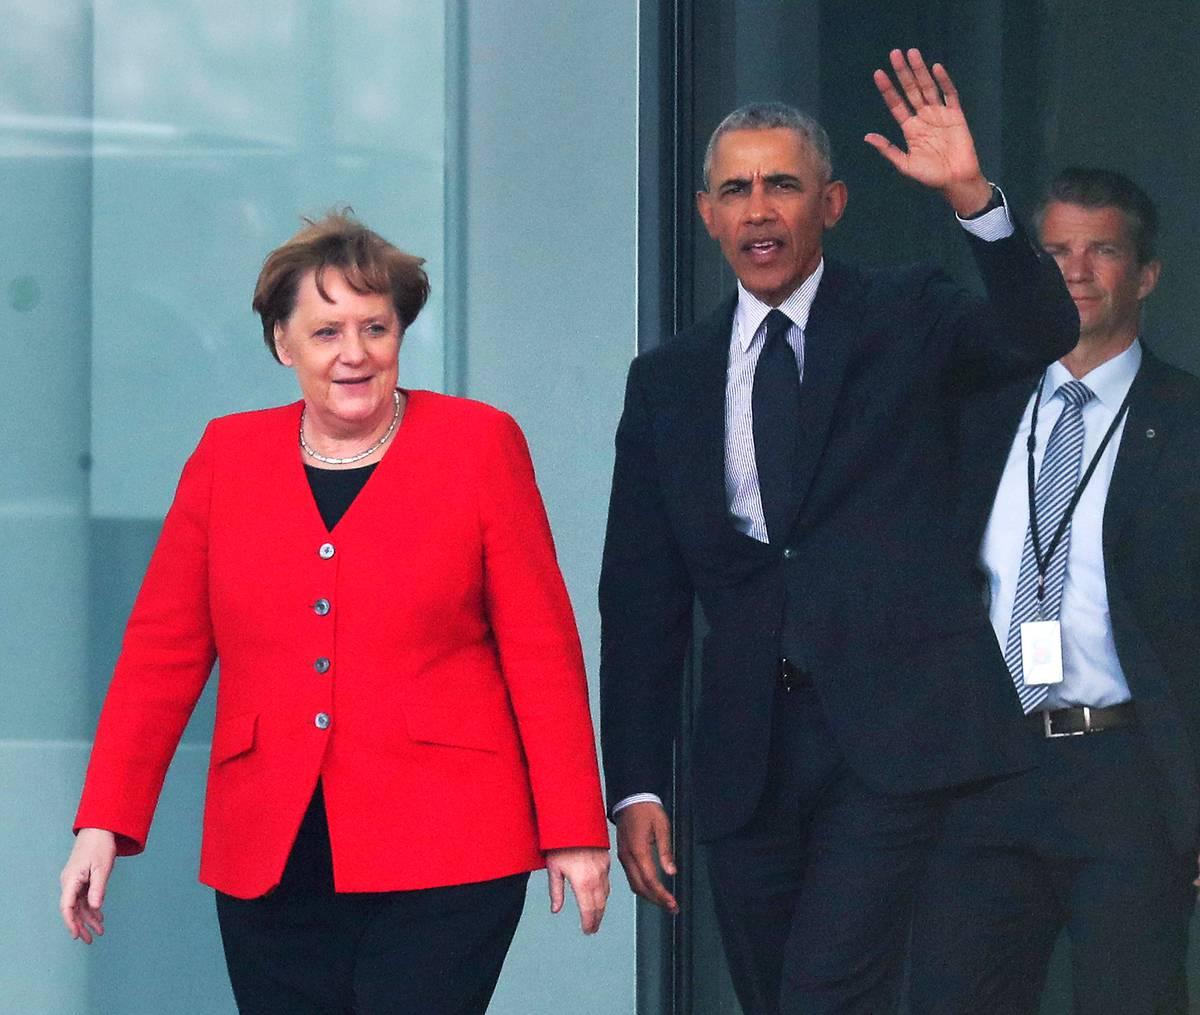 Trump who? Angela Merkel gives Barack Obama a very warm welcome